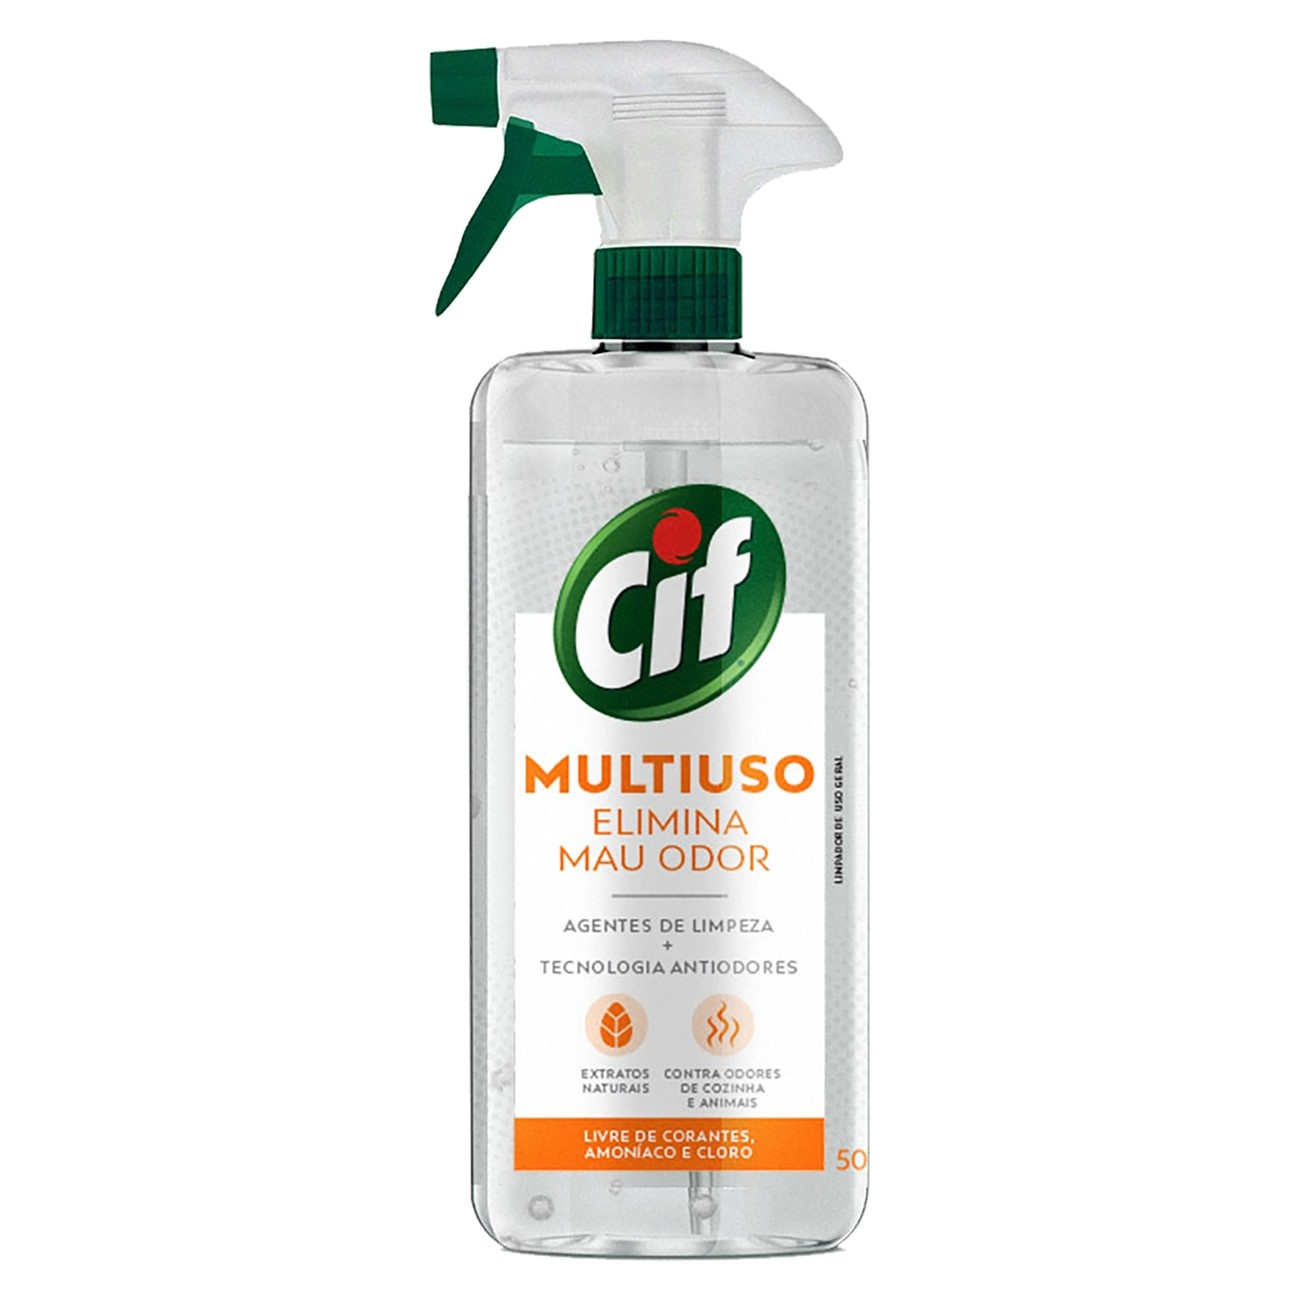 Limpador Multiuso Cif Gatilho Elimina Mau Odor 500ml